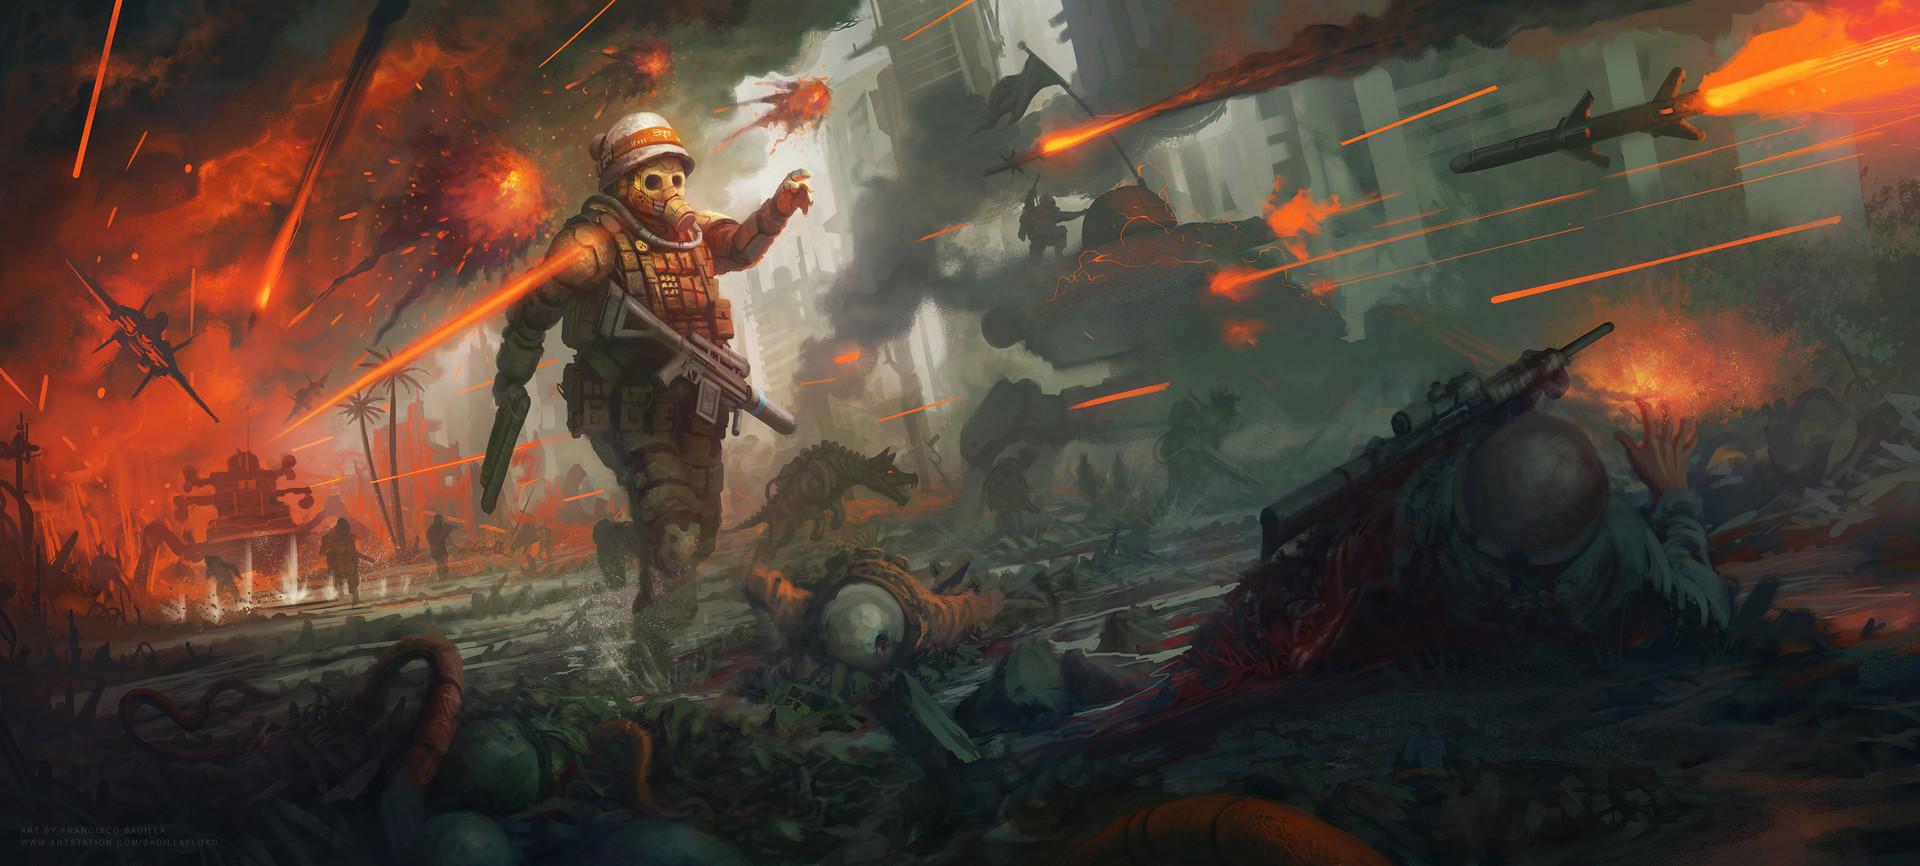 Battlefield concept - Full image